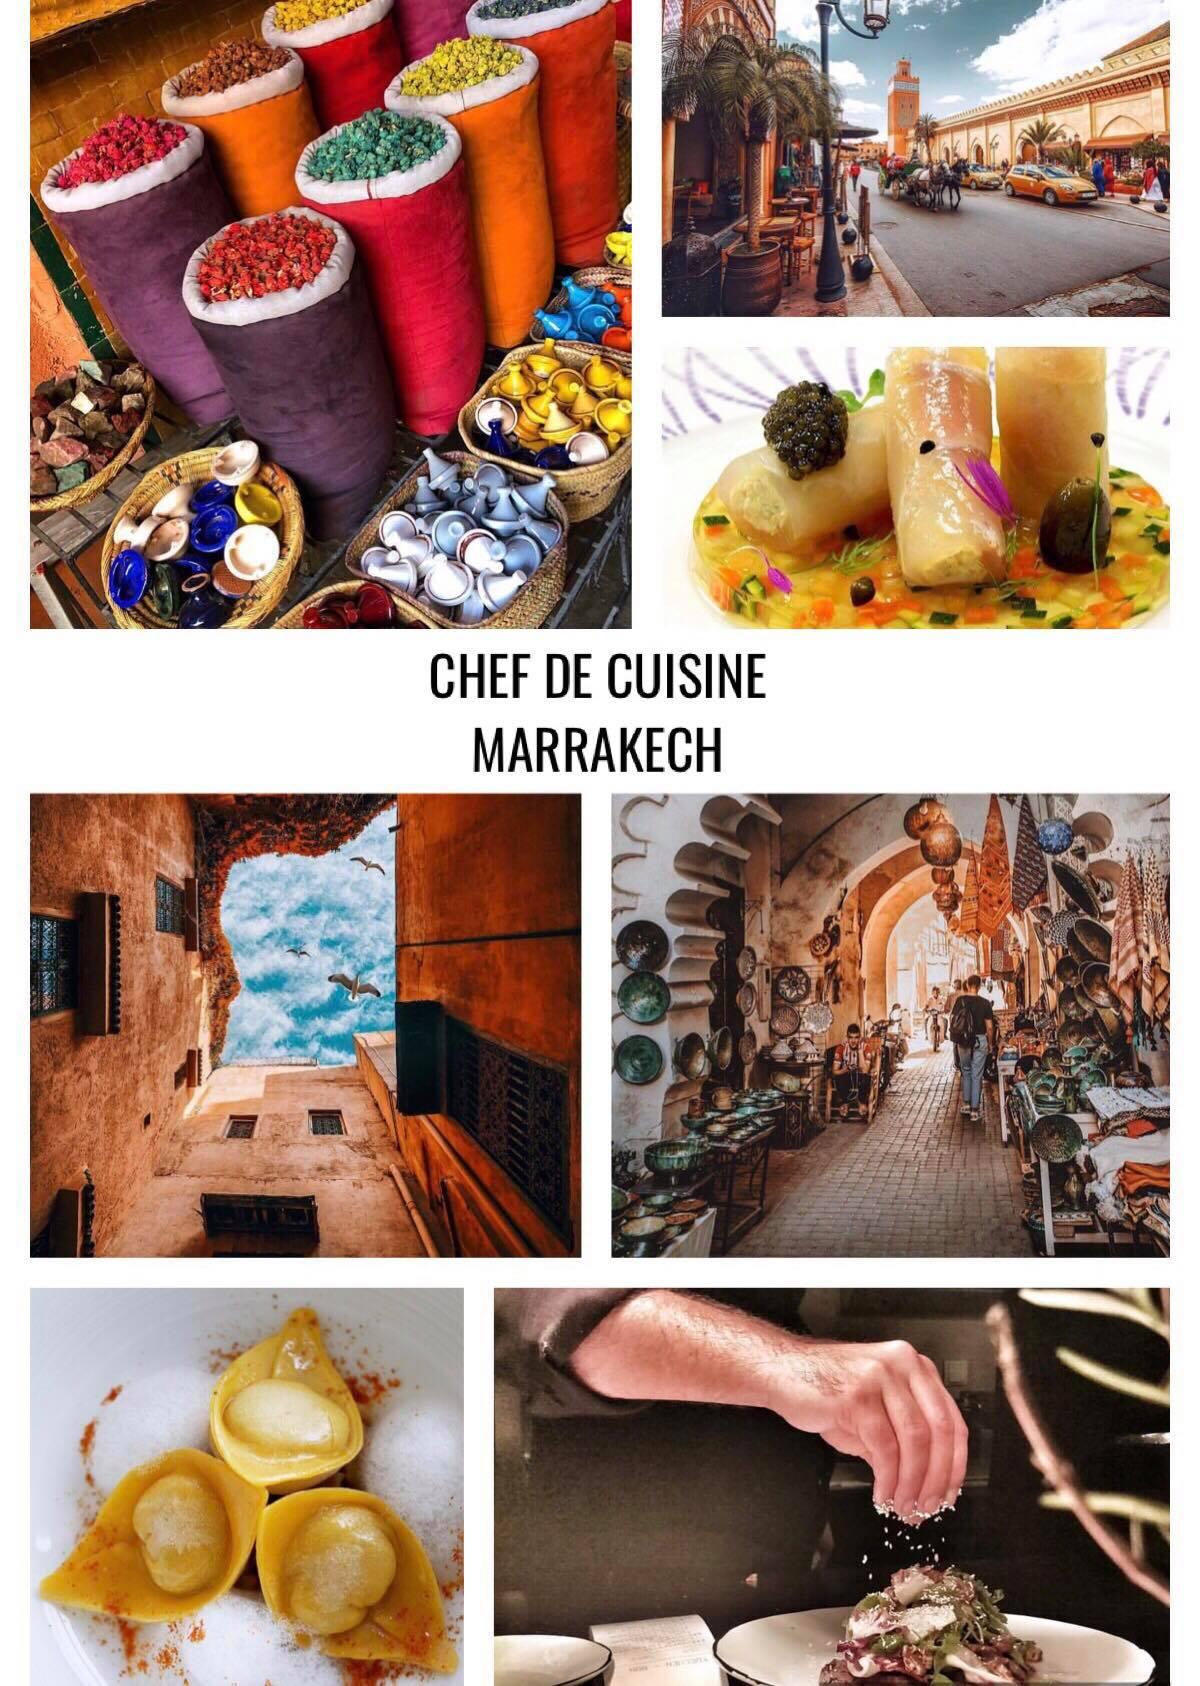 Chef de cuisine rhea recrutement for Offre emploi chef gerant restauration collective